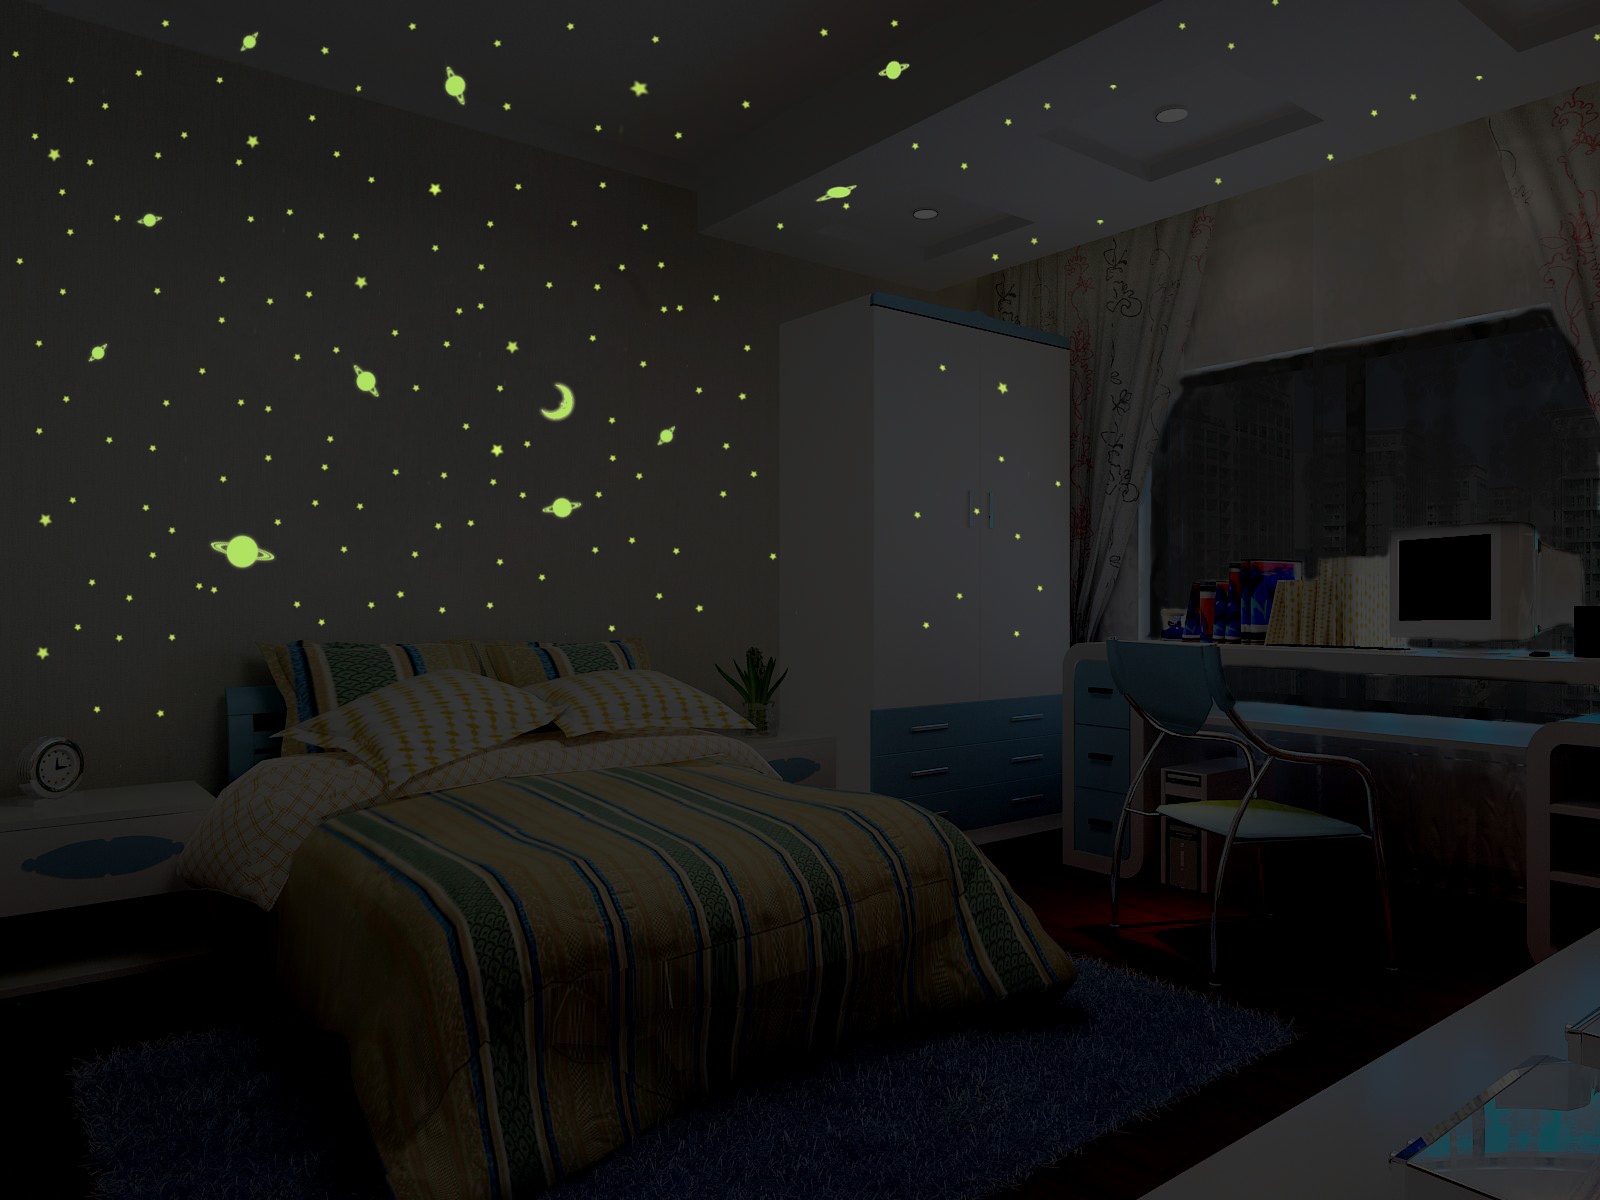 Sticker univers environ 150 toiles et plan tes - Etoiles fluorescentes plafond chambre ...